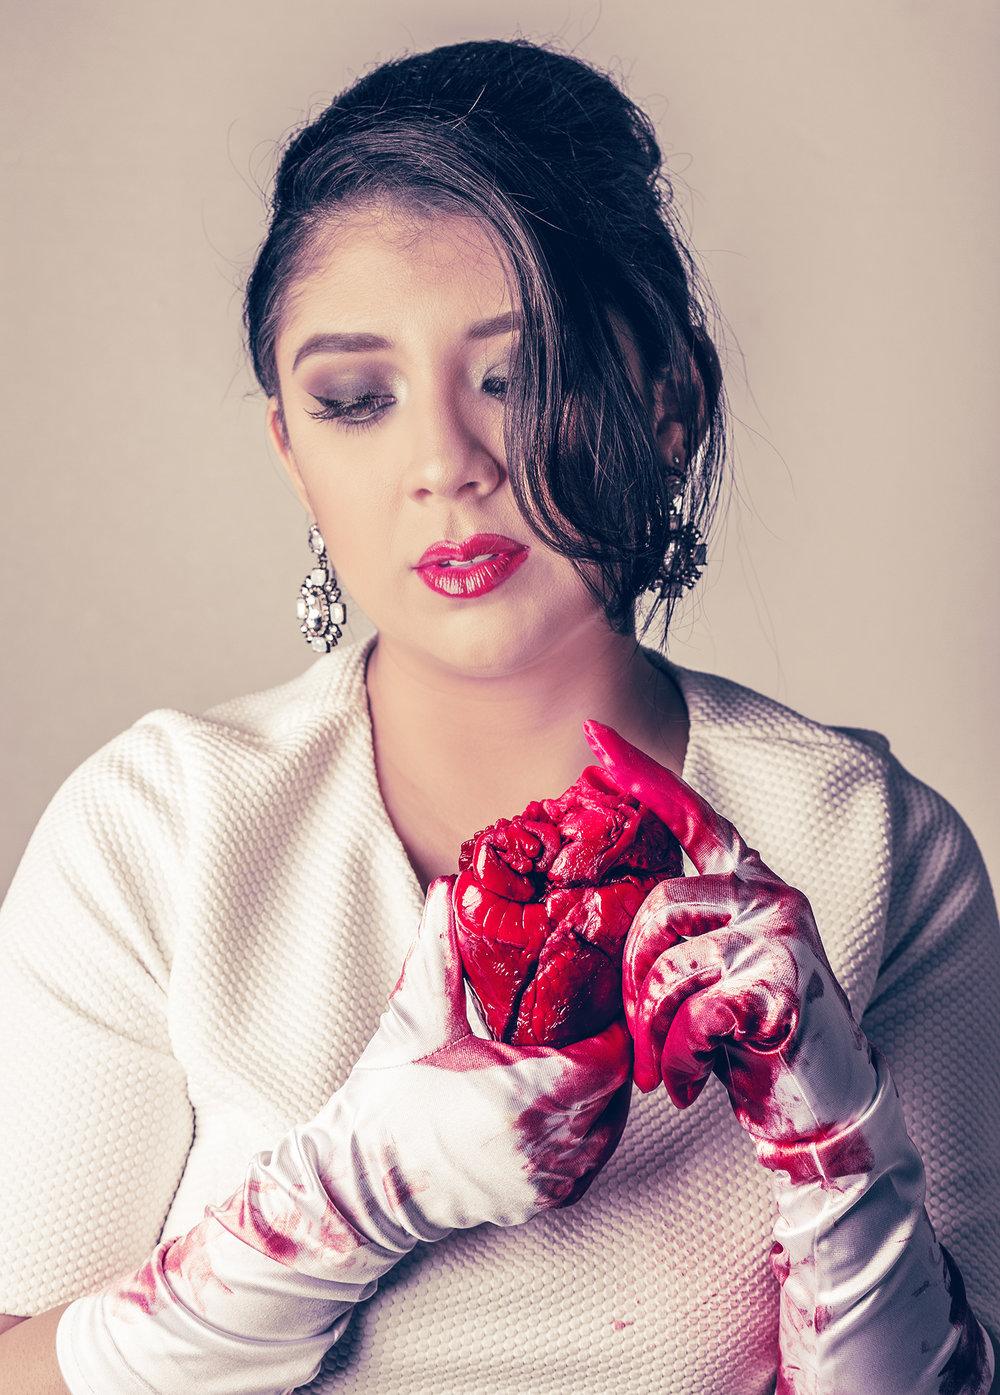 MichelleRiveraSpromberg-AlessaWithHeart-160.jpg